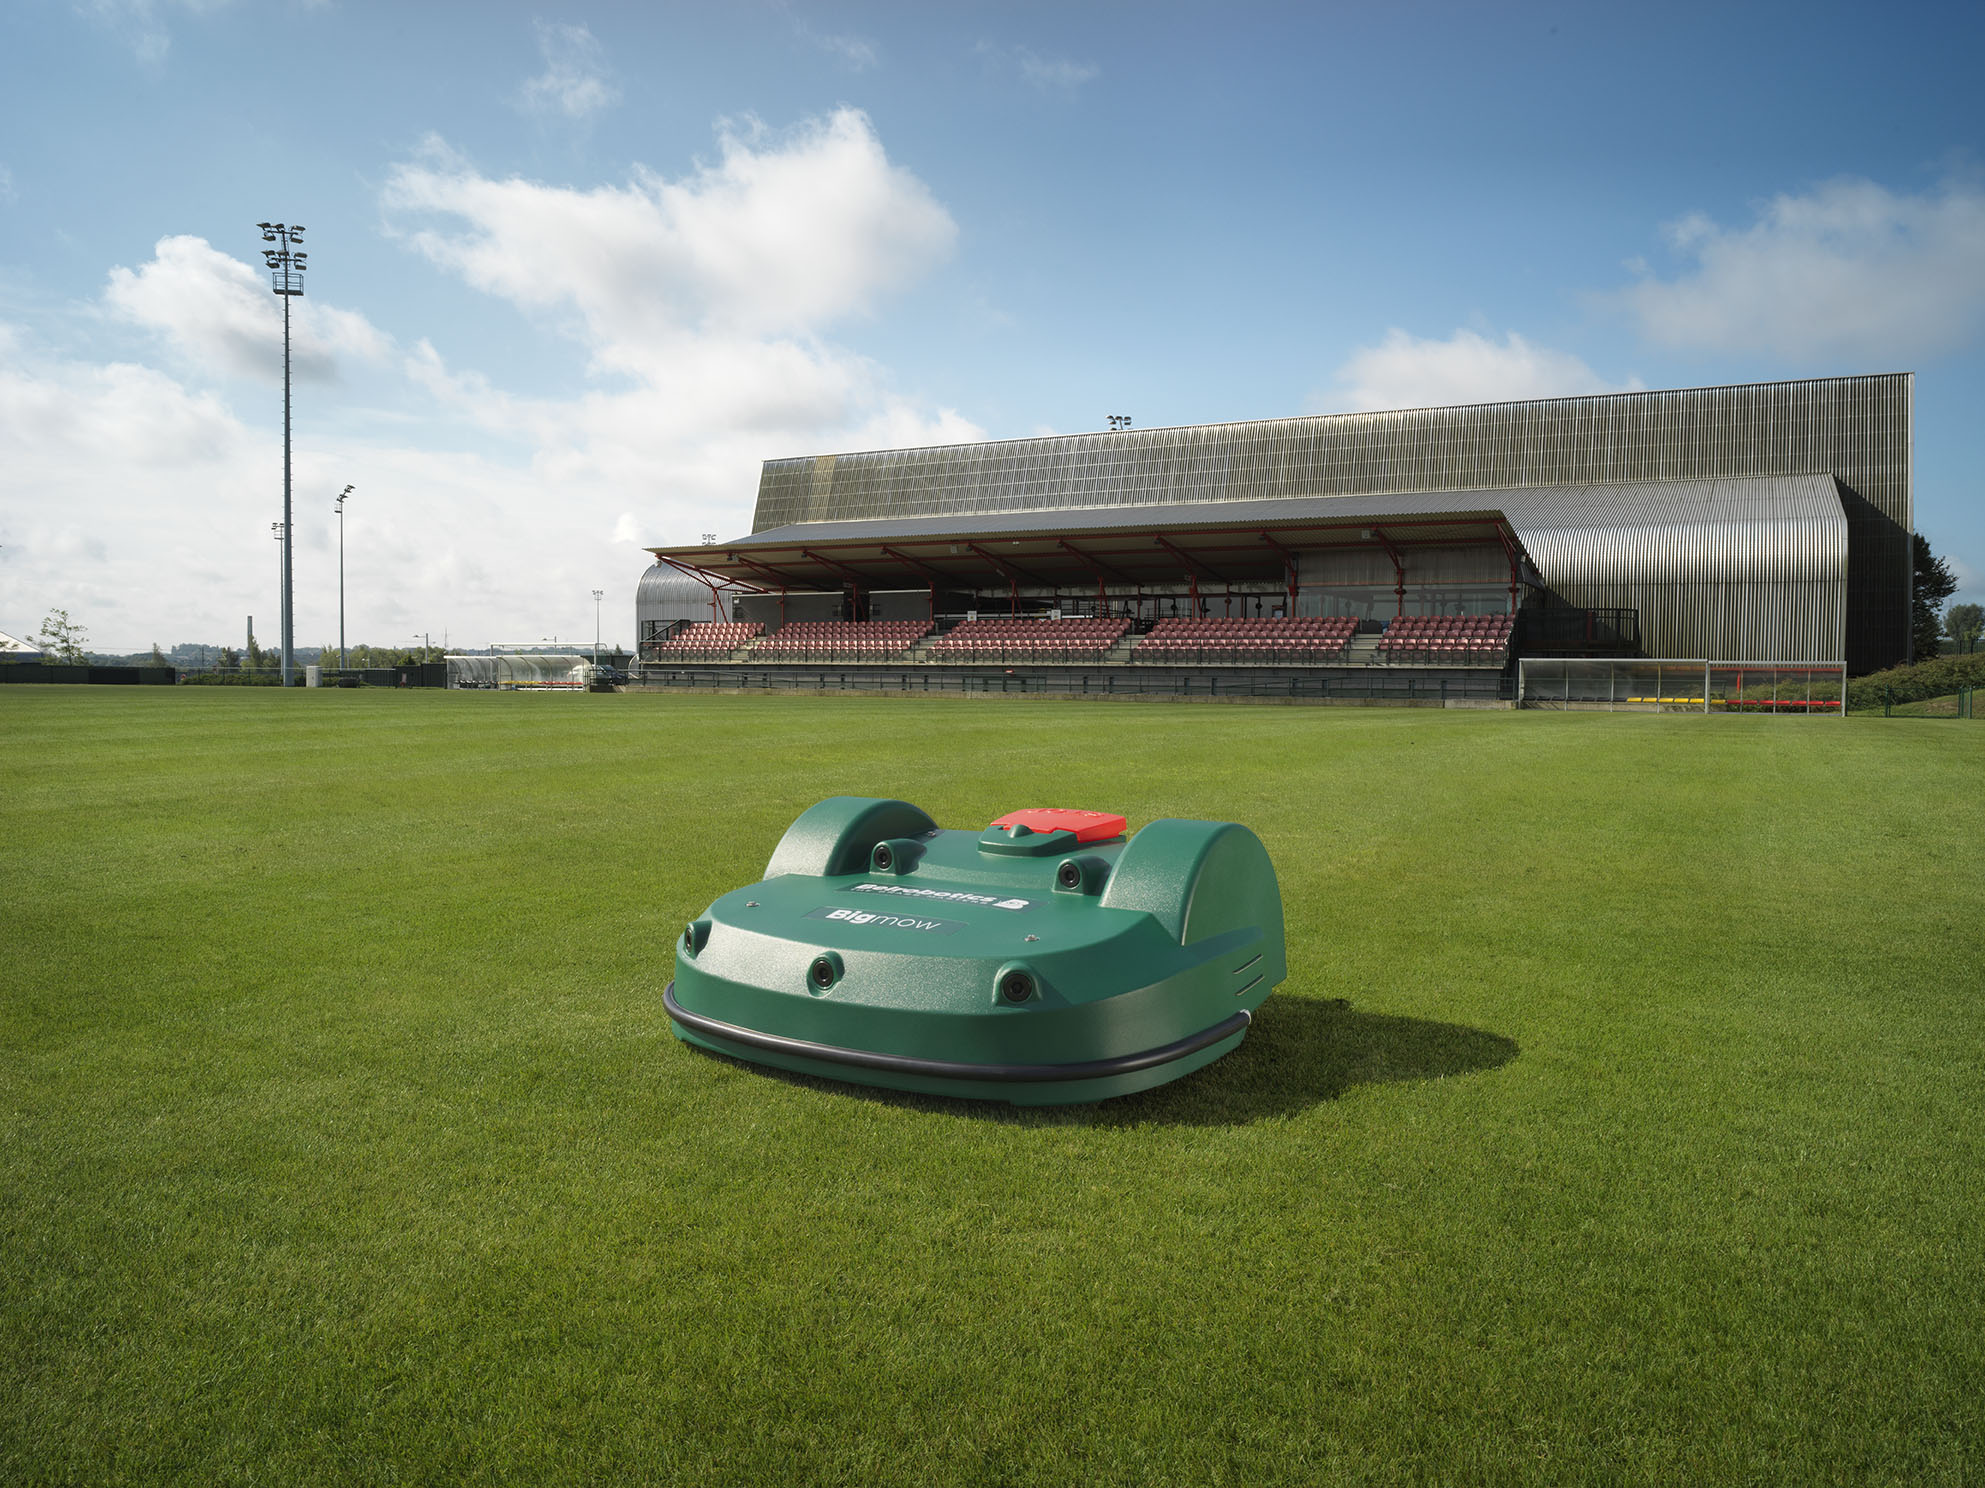 advantages of clubs / facilities, Advantages of Clubs / Facilities